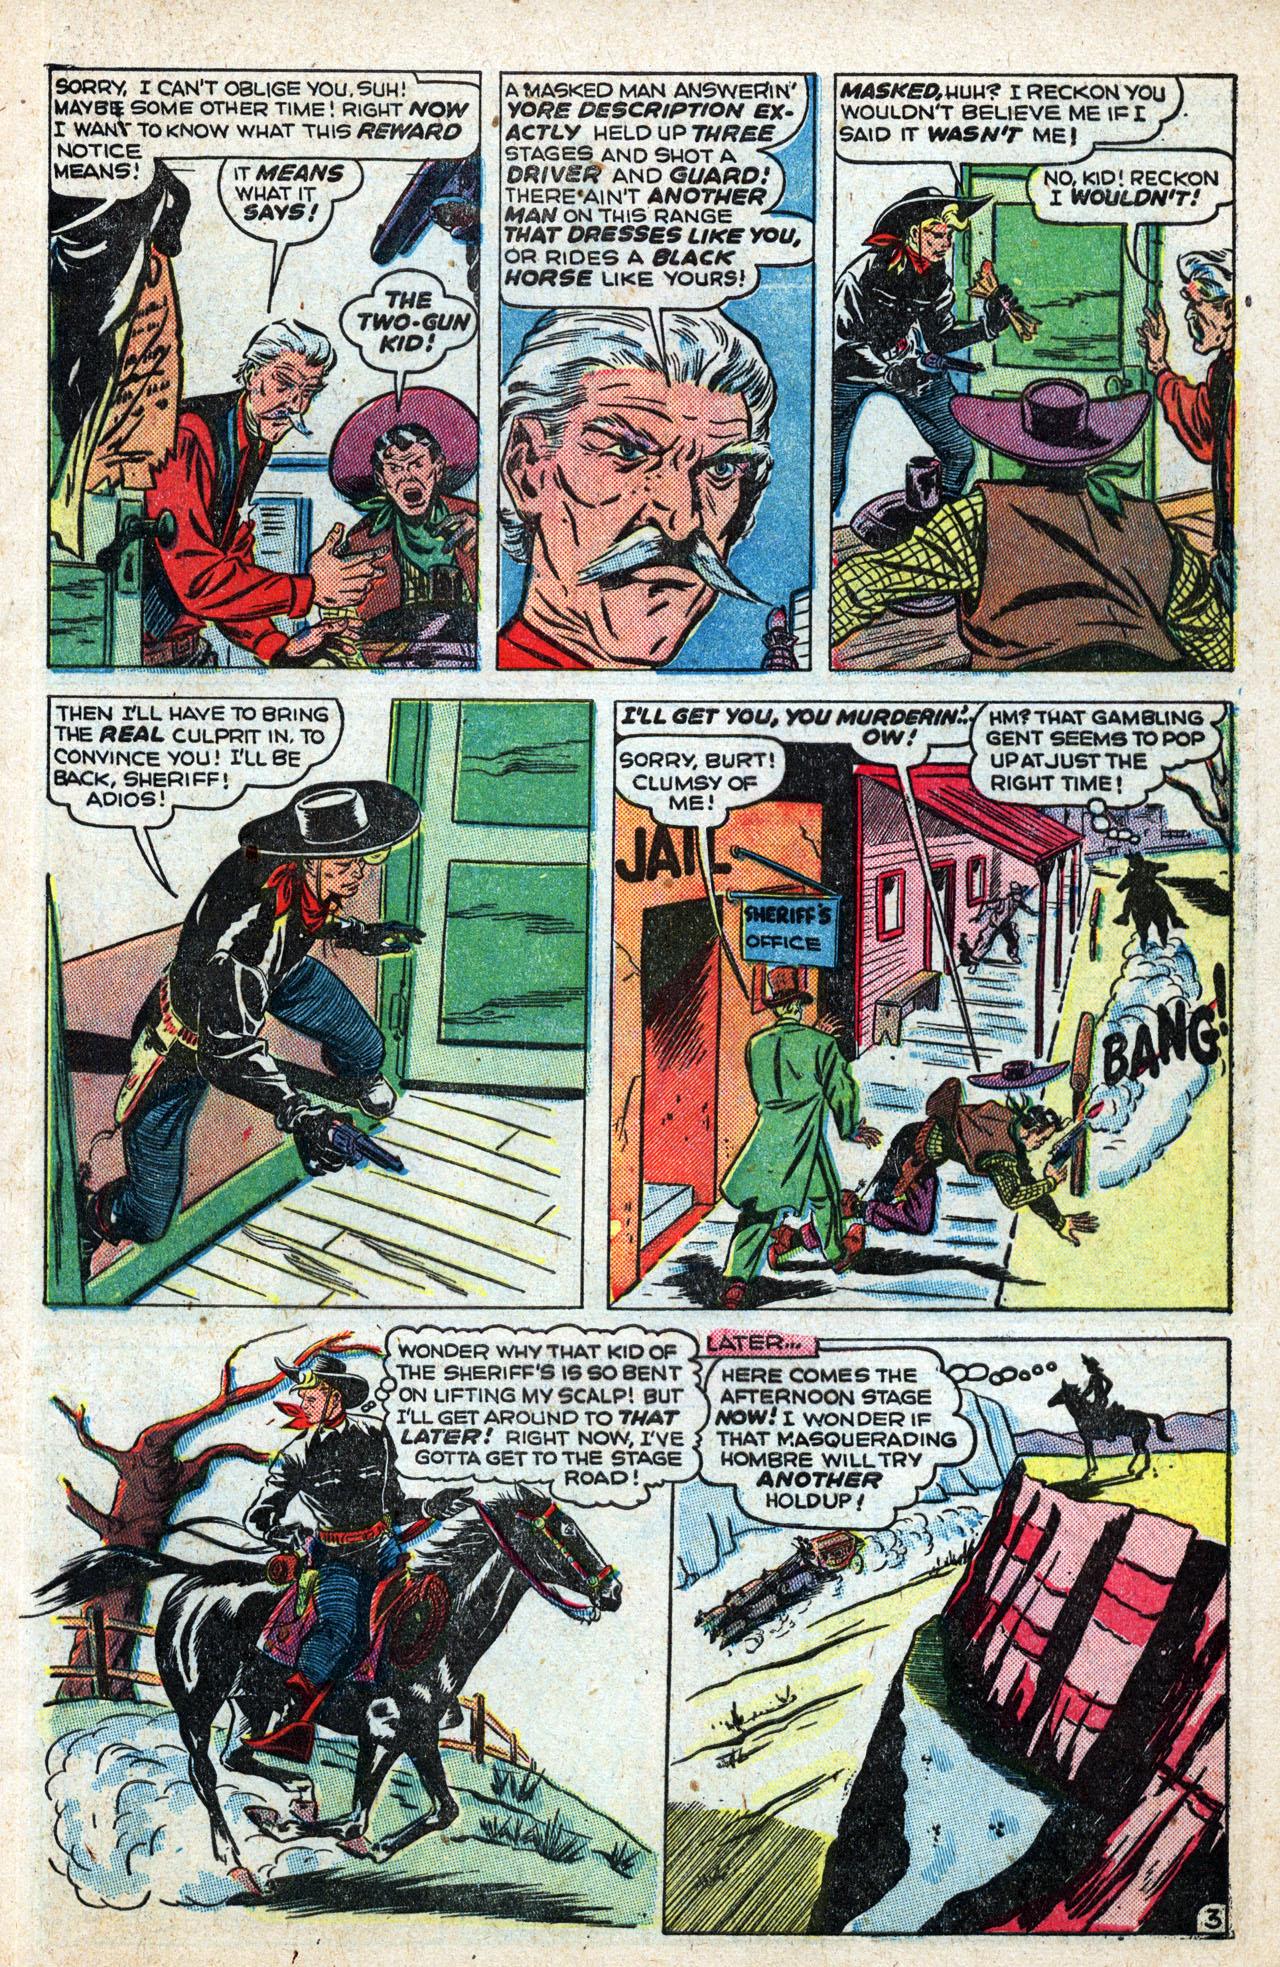 Read online Two-Gun Kid comic -  Issue #4 - 5